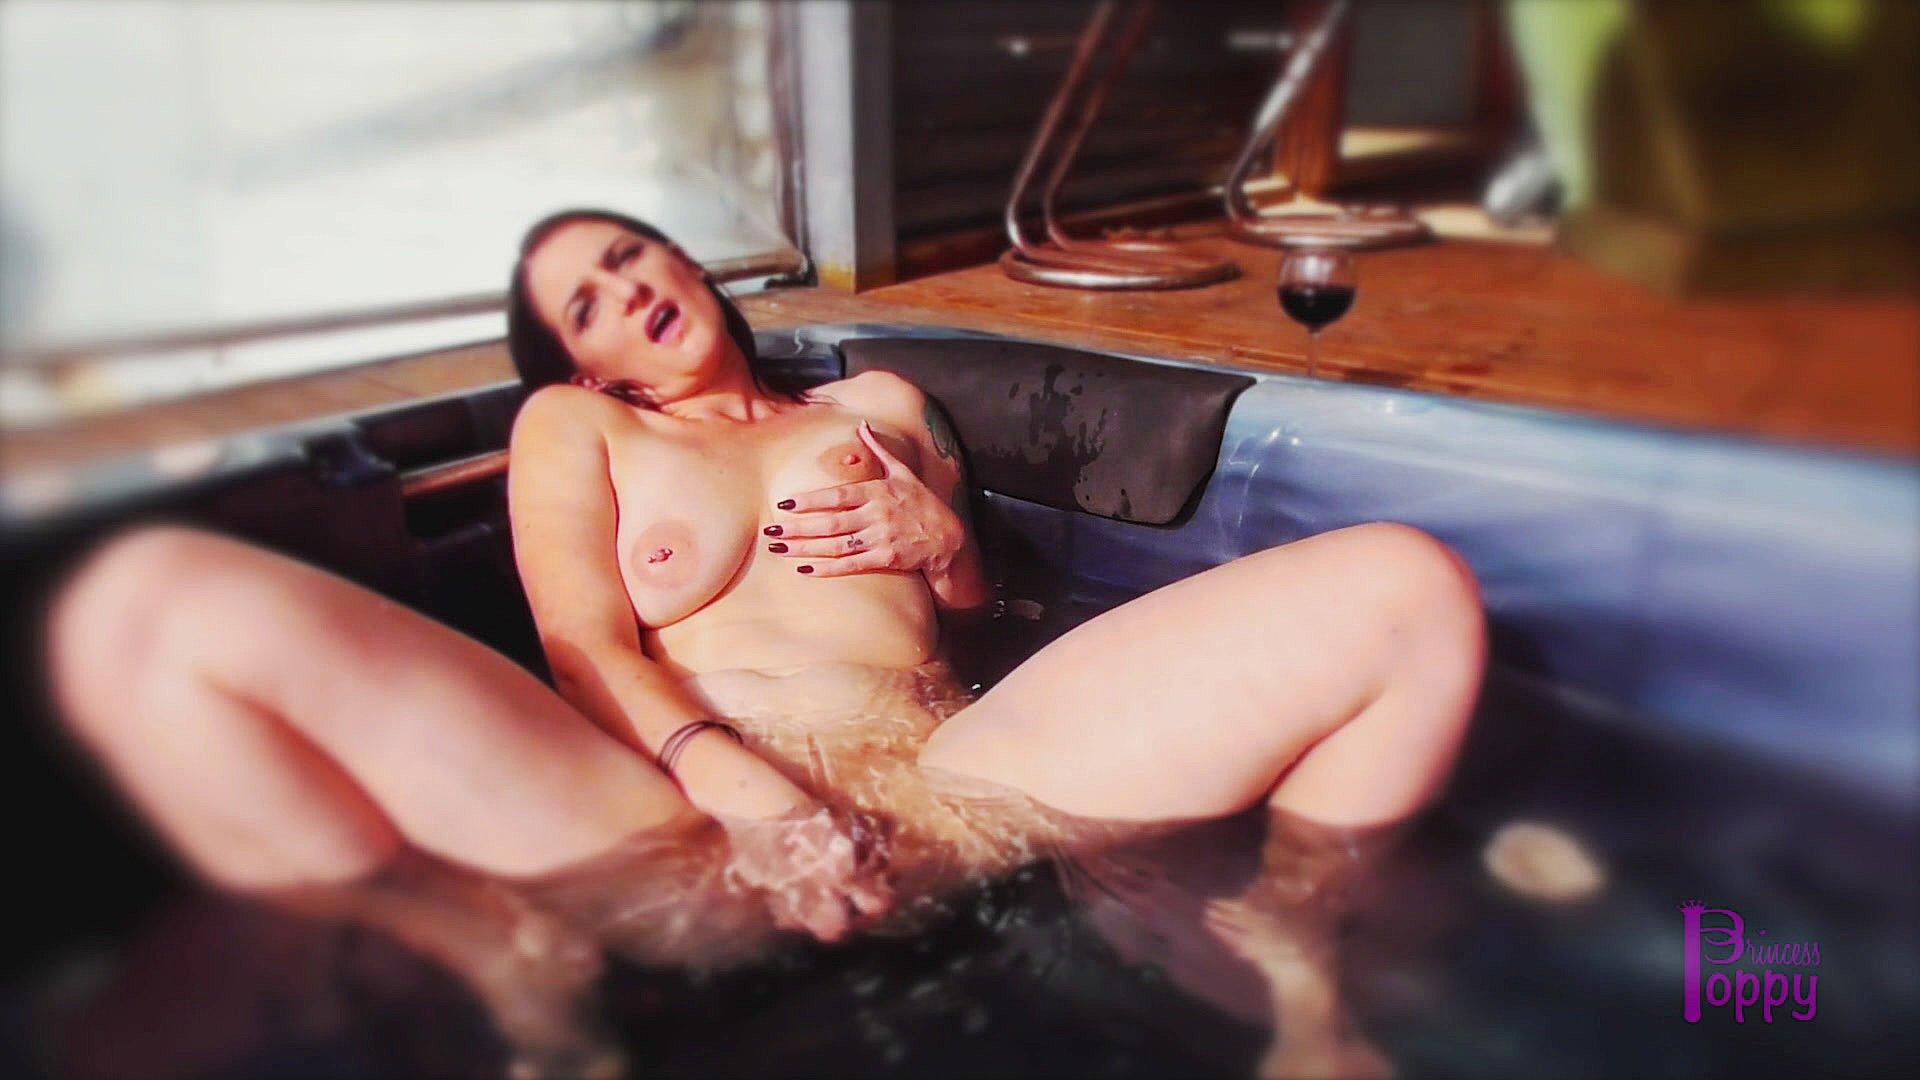 Wife funcking 2 cocks fucking videos